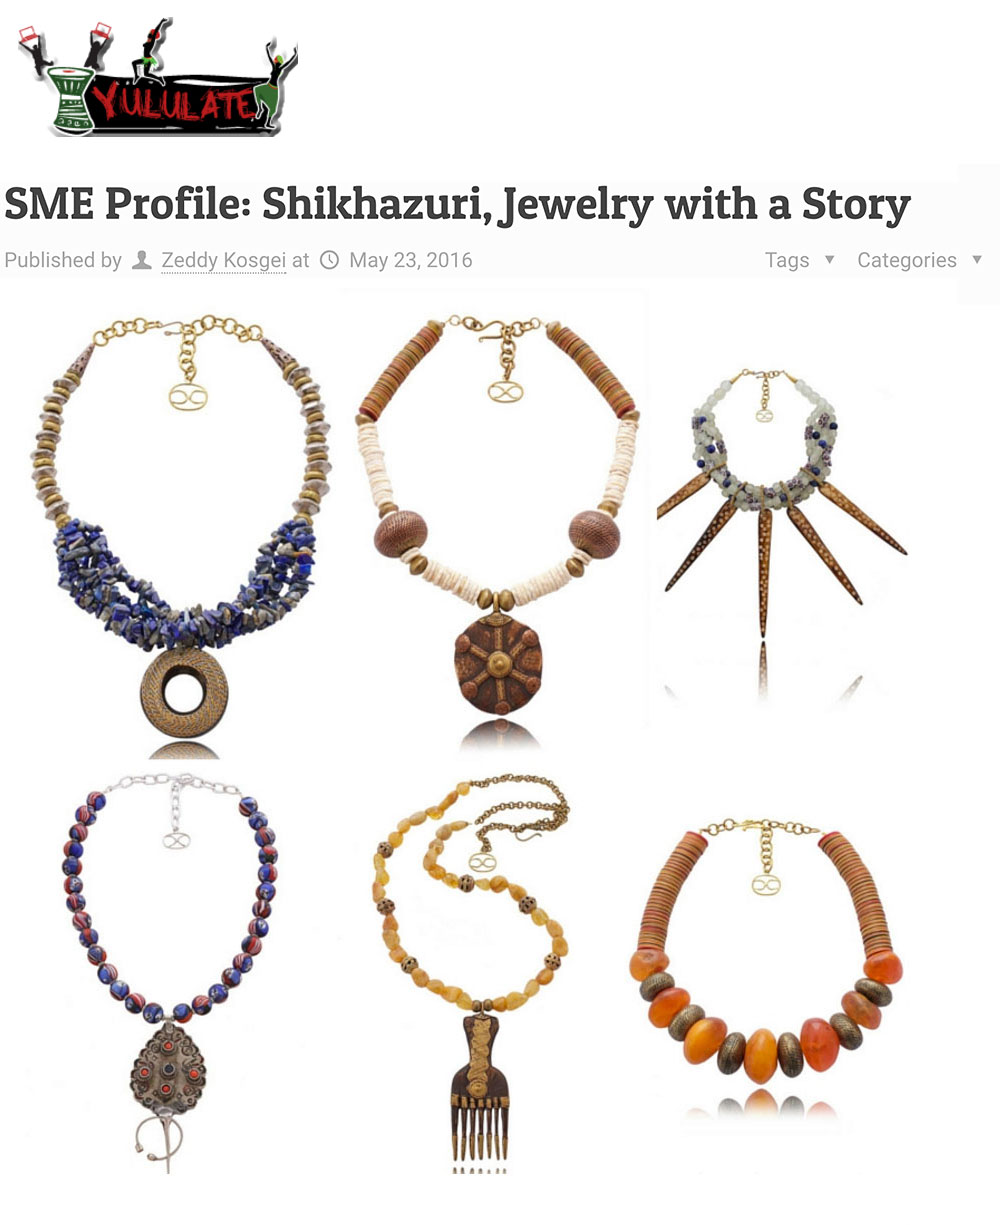 Yululate Blog - SHIKHAZURI Jewellery